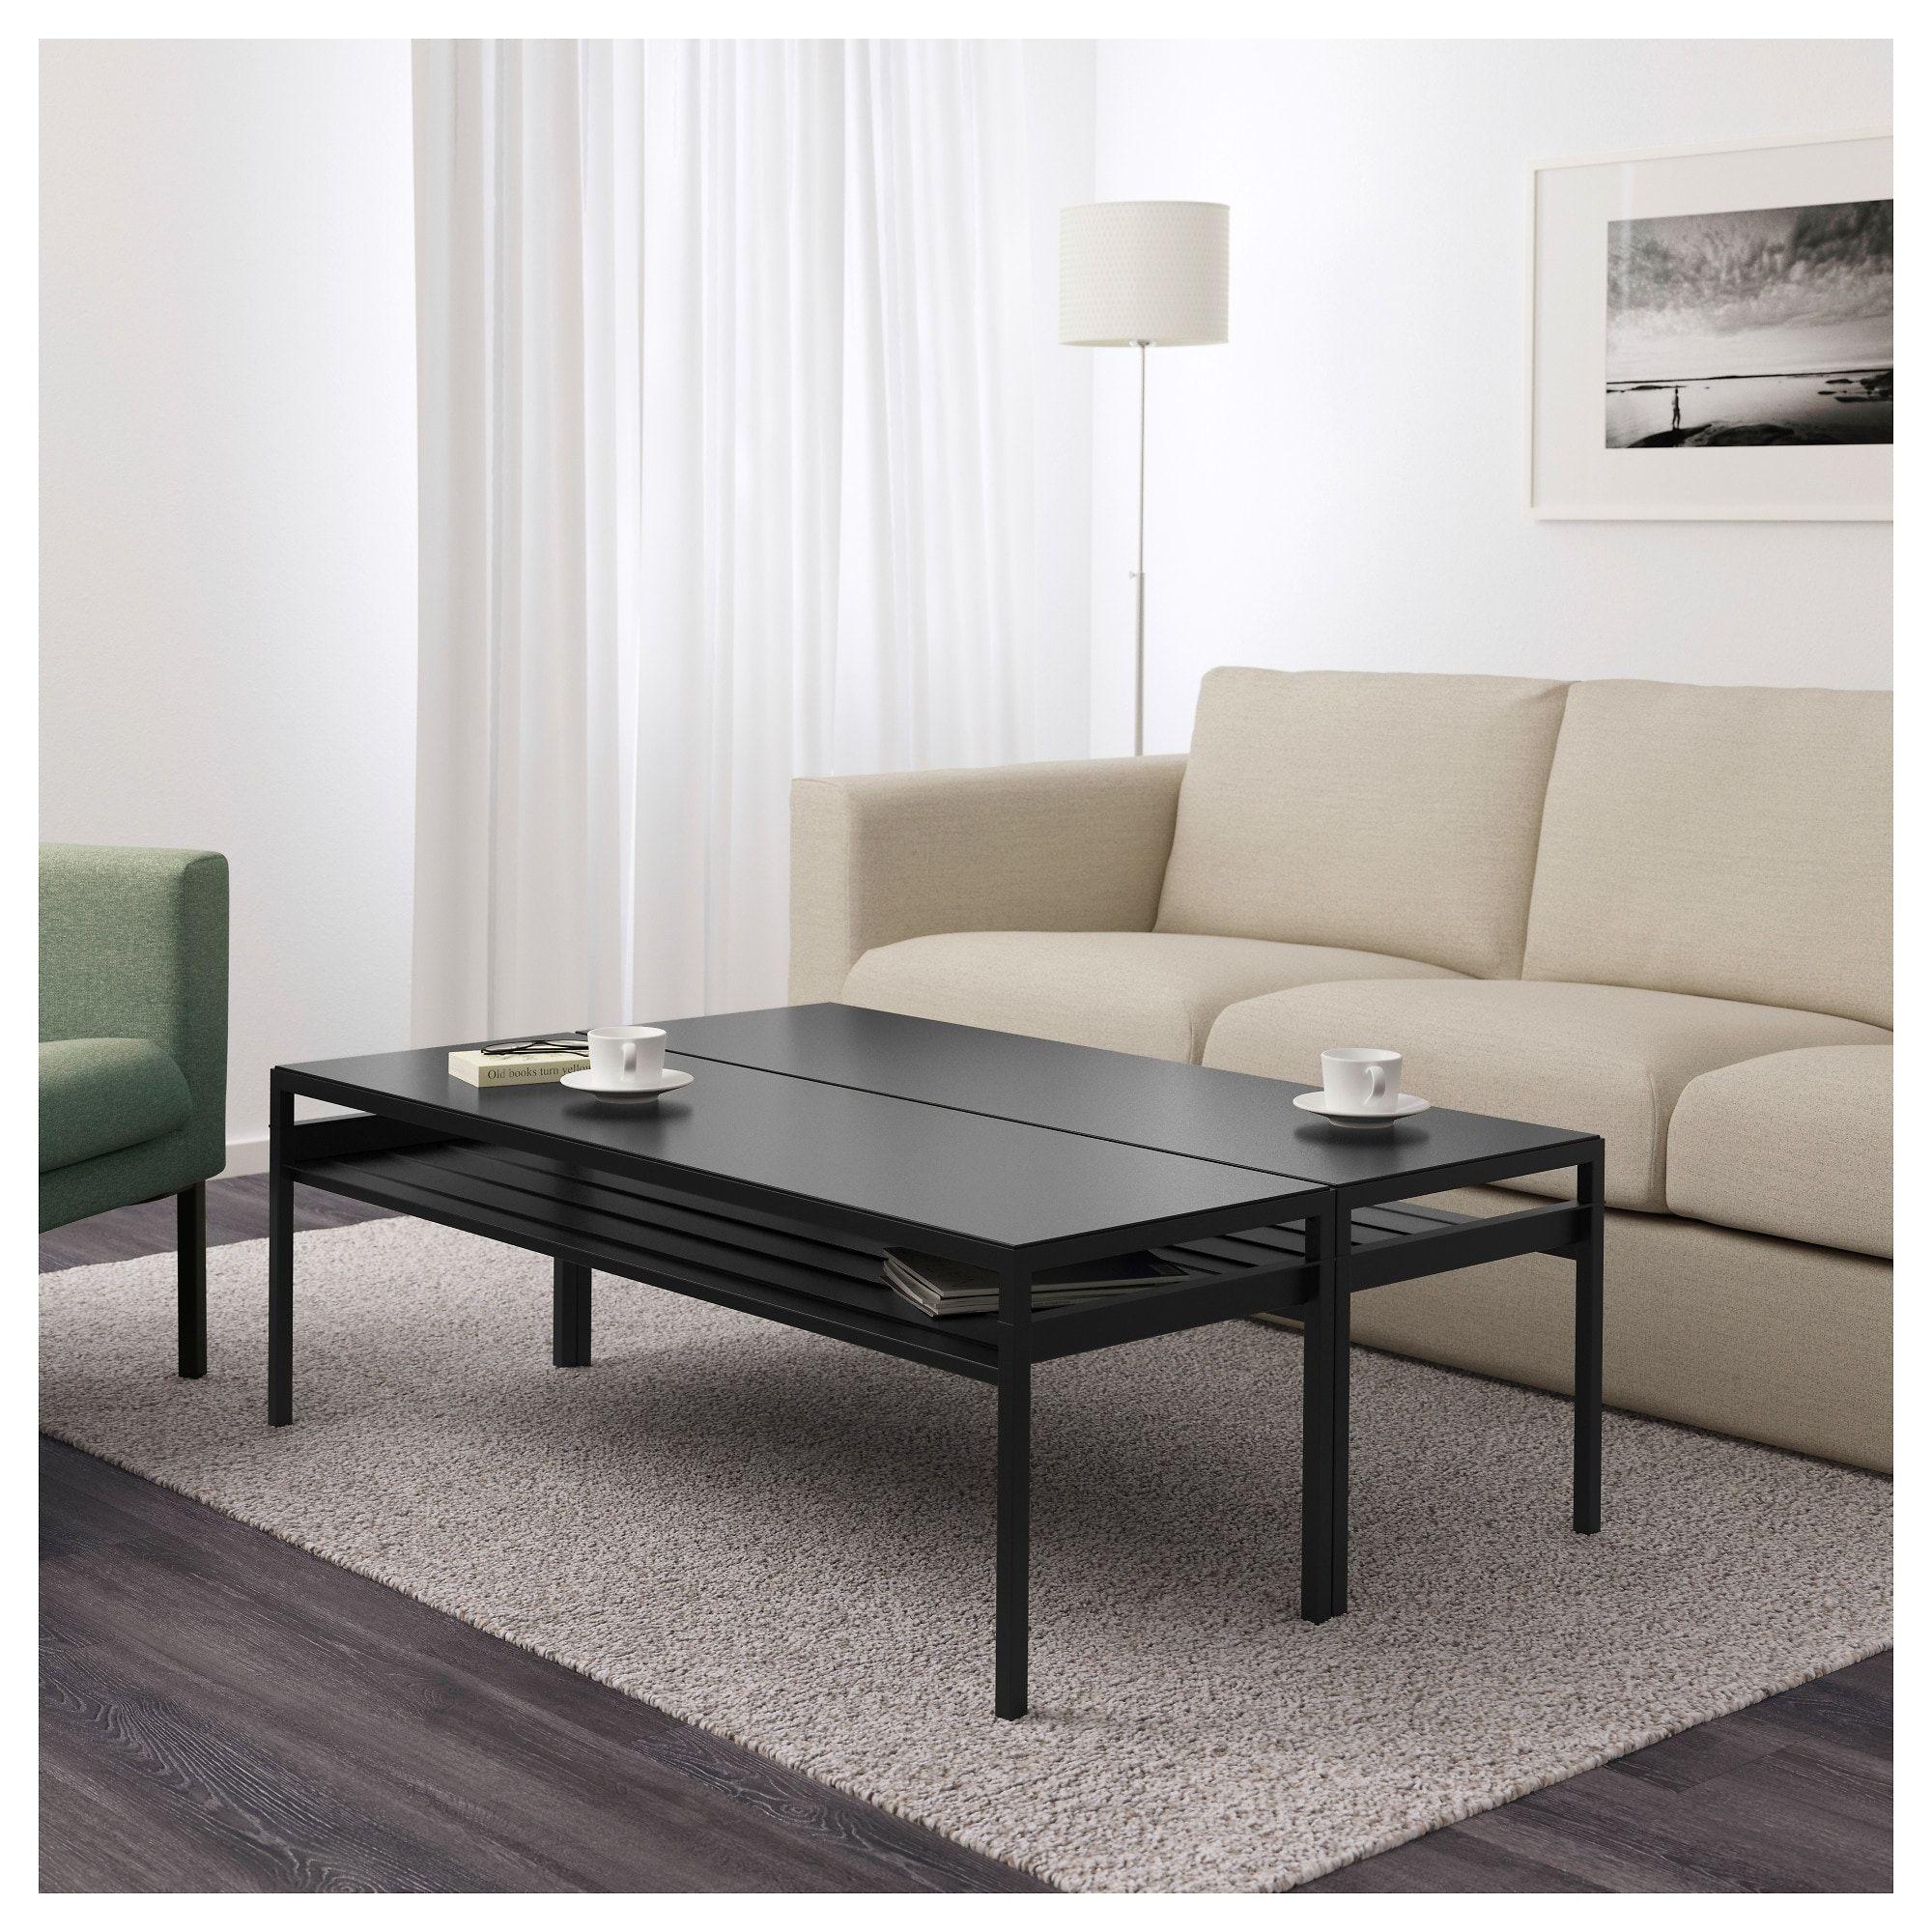 Incredible Ikea Nyboda Black Beige Coffee Table W Reversible Table Top Machost Co Dining Chair Design Ideas Machostcouk